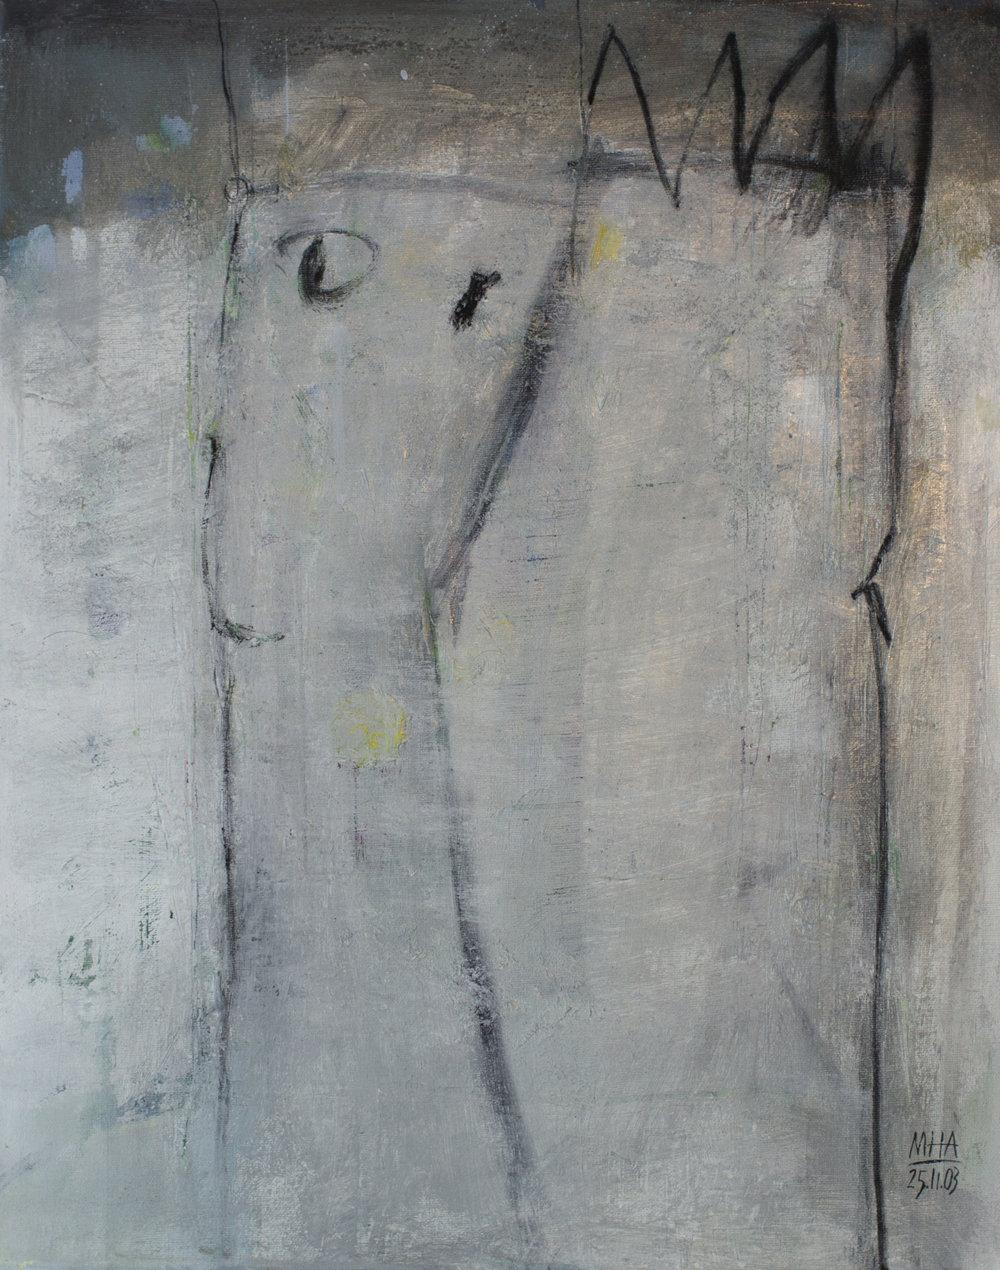 Krönung , 2003,Acryl auf Leinwand - Mischtechnik, 40x50 cm